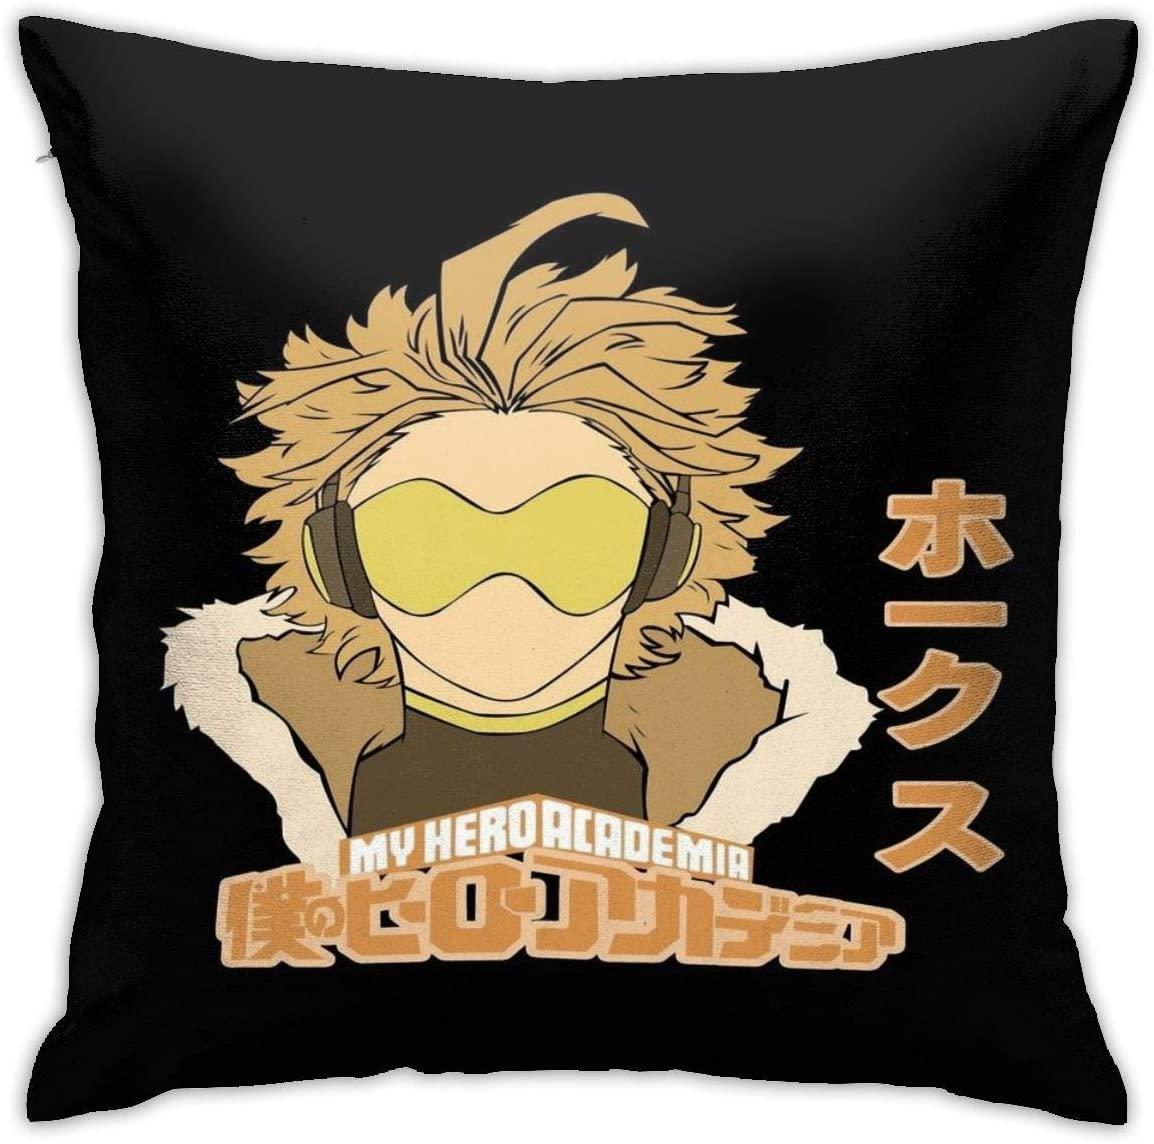 My Hero Academia Hawk Graphic Pillowcases, Floor Pillowcases, Pillowcases, Sofa Cushions, Cushion Covers, Backrest Covers, Car Cushion Interiors